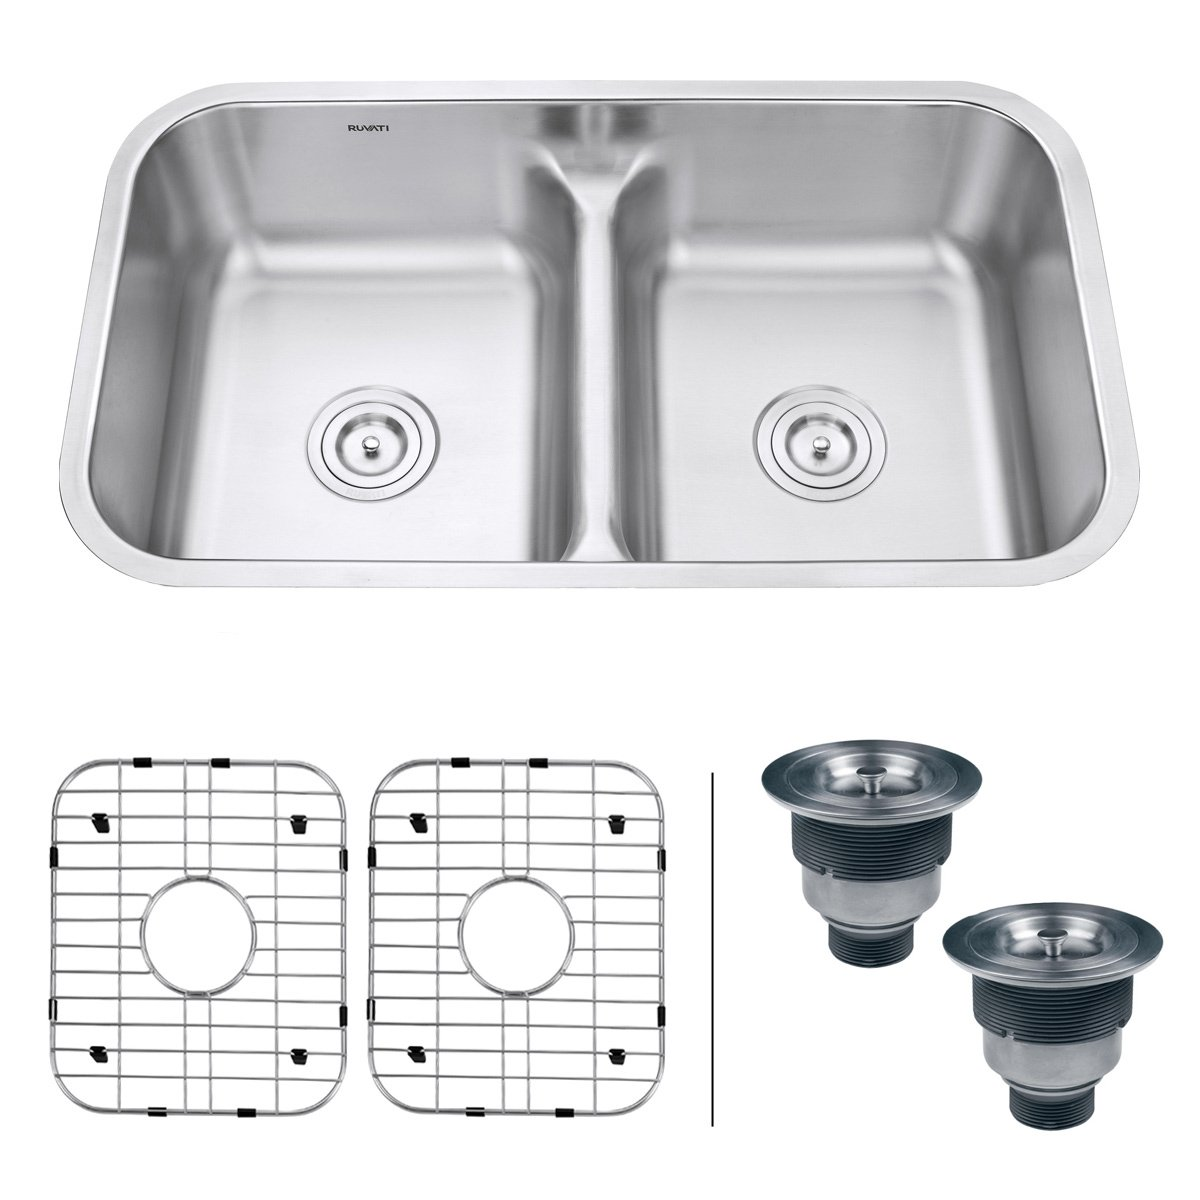 Ruvati 32-inch Low-Divide 50/50 Double Bowl Undermount 16 Gauge Stainless Steel Kitchen Sink - RVM4350 by Ruvati